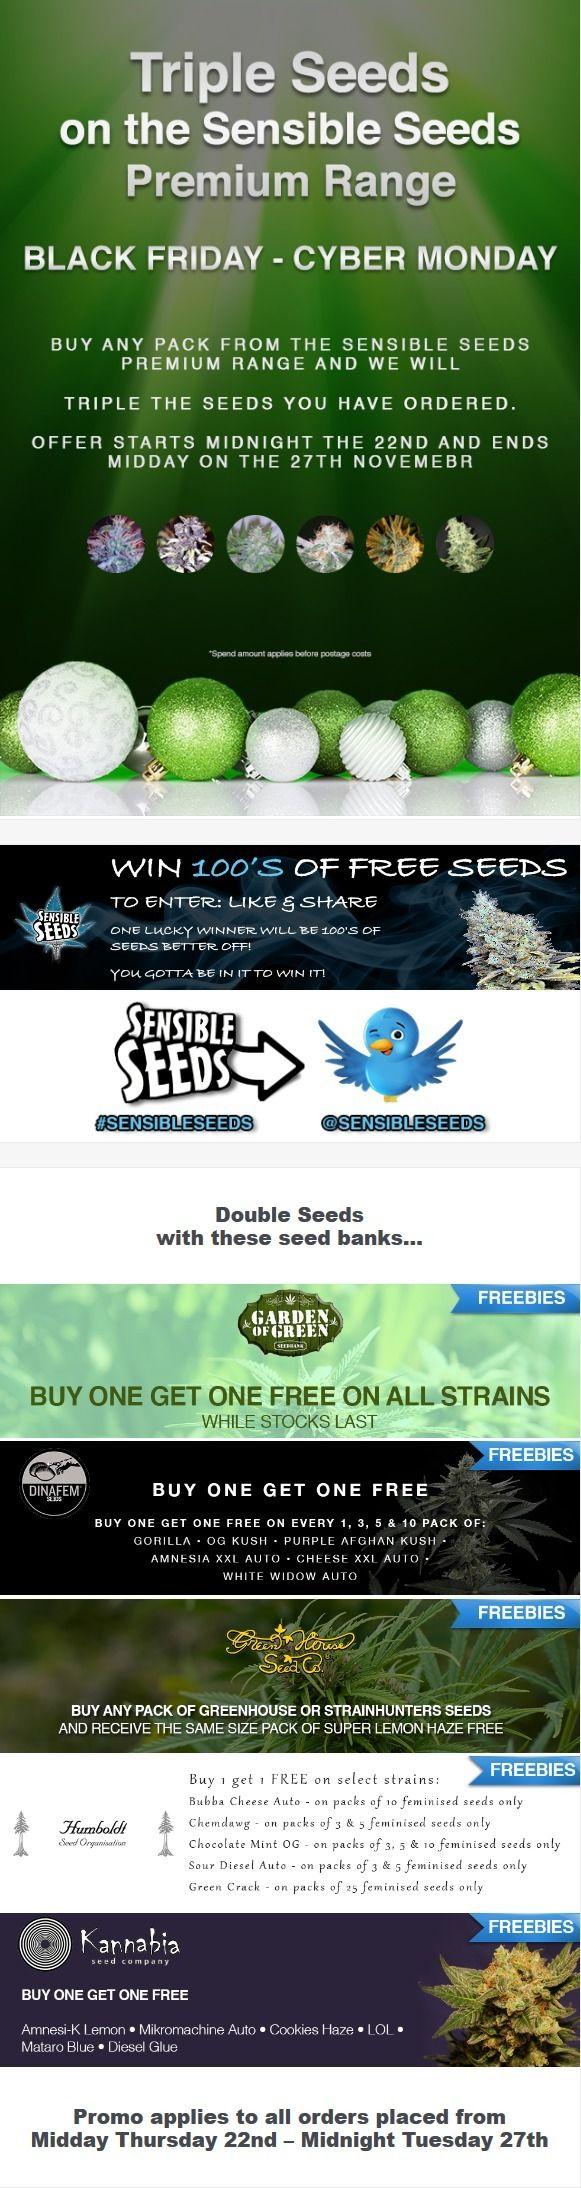 Black Friday Promo Seeds offeri - sensibleseeds | ello